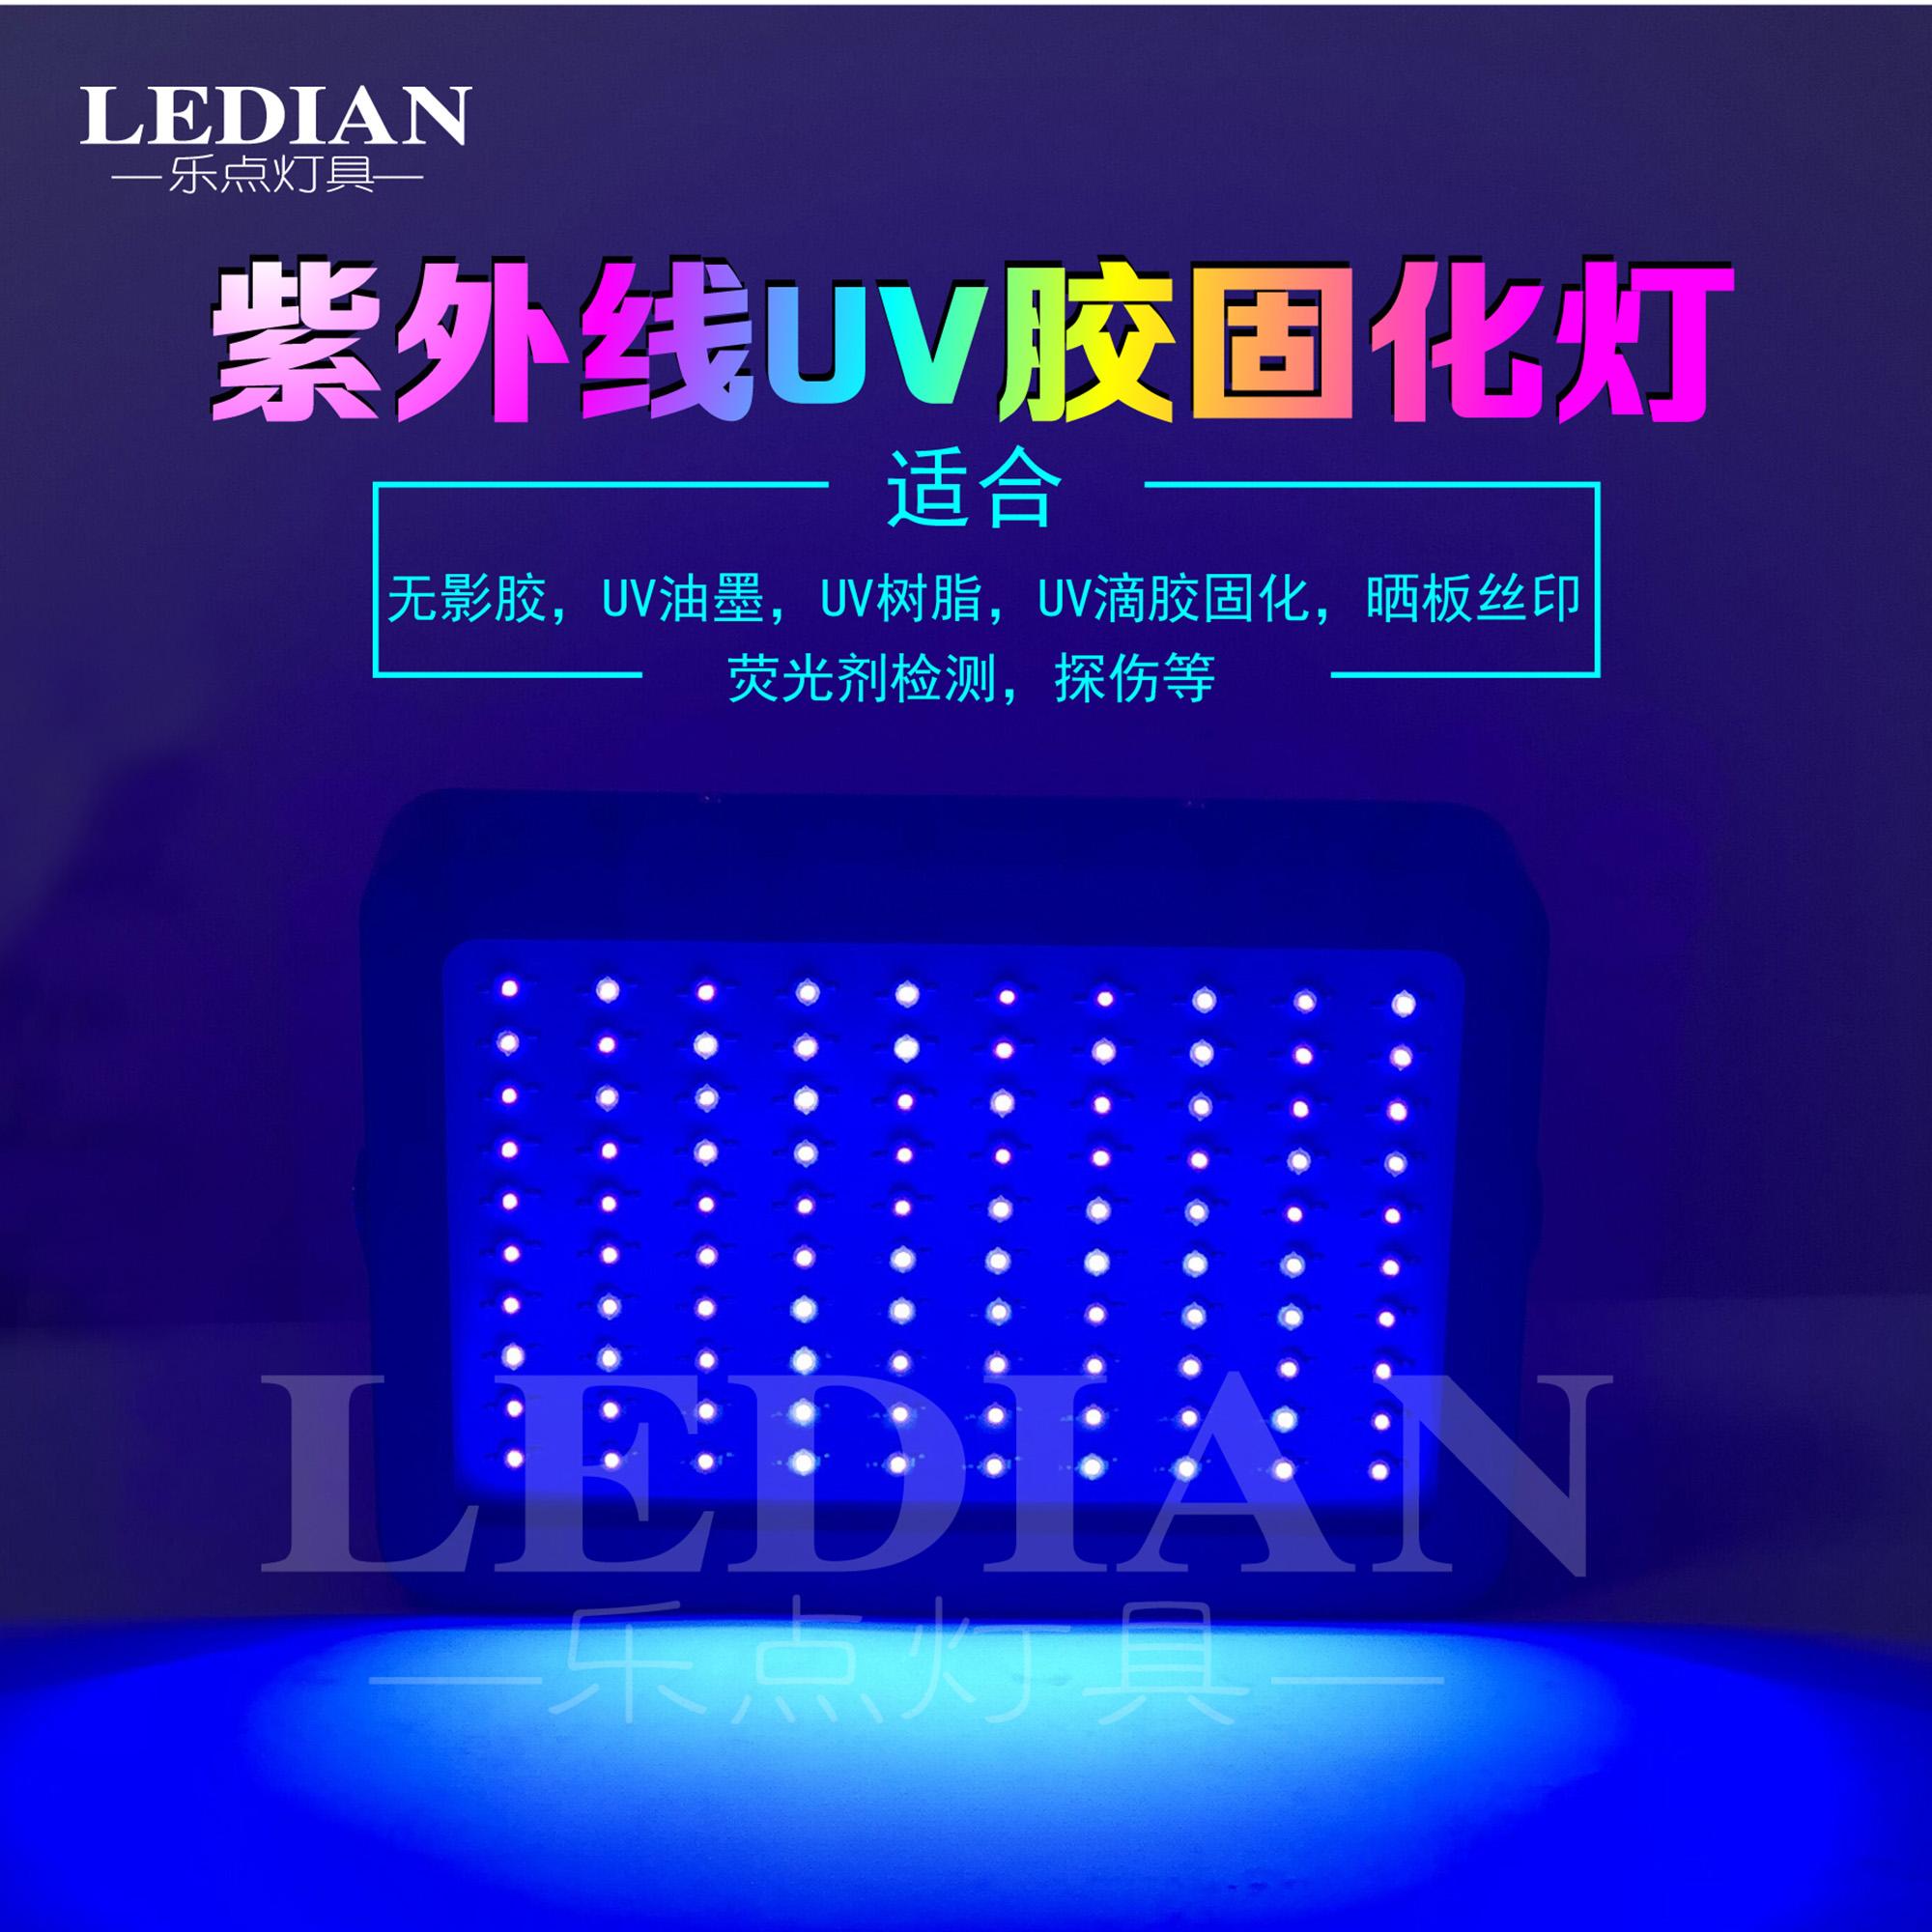 led大功率UV灯探伤UV滴胶无影胶固化 紫外线绿油墨丝印树脂晒版灯